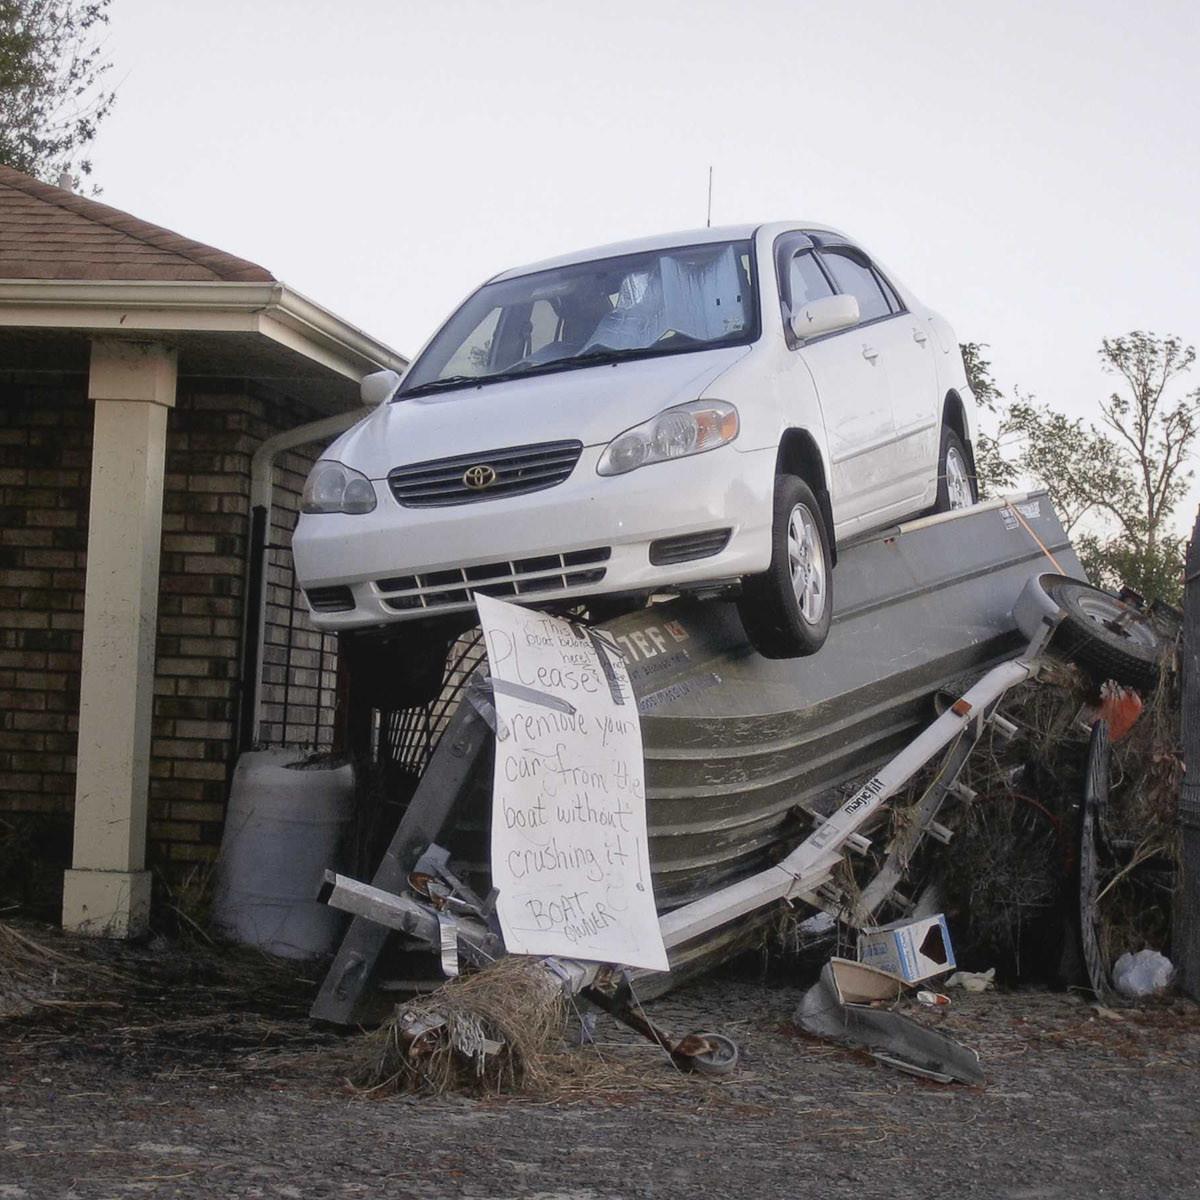 News_MFAH_Richard Misrach_After Katrina_Remove your car